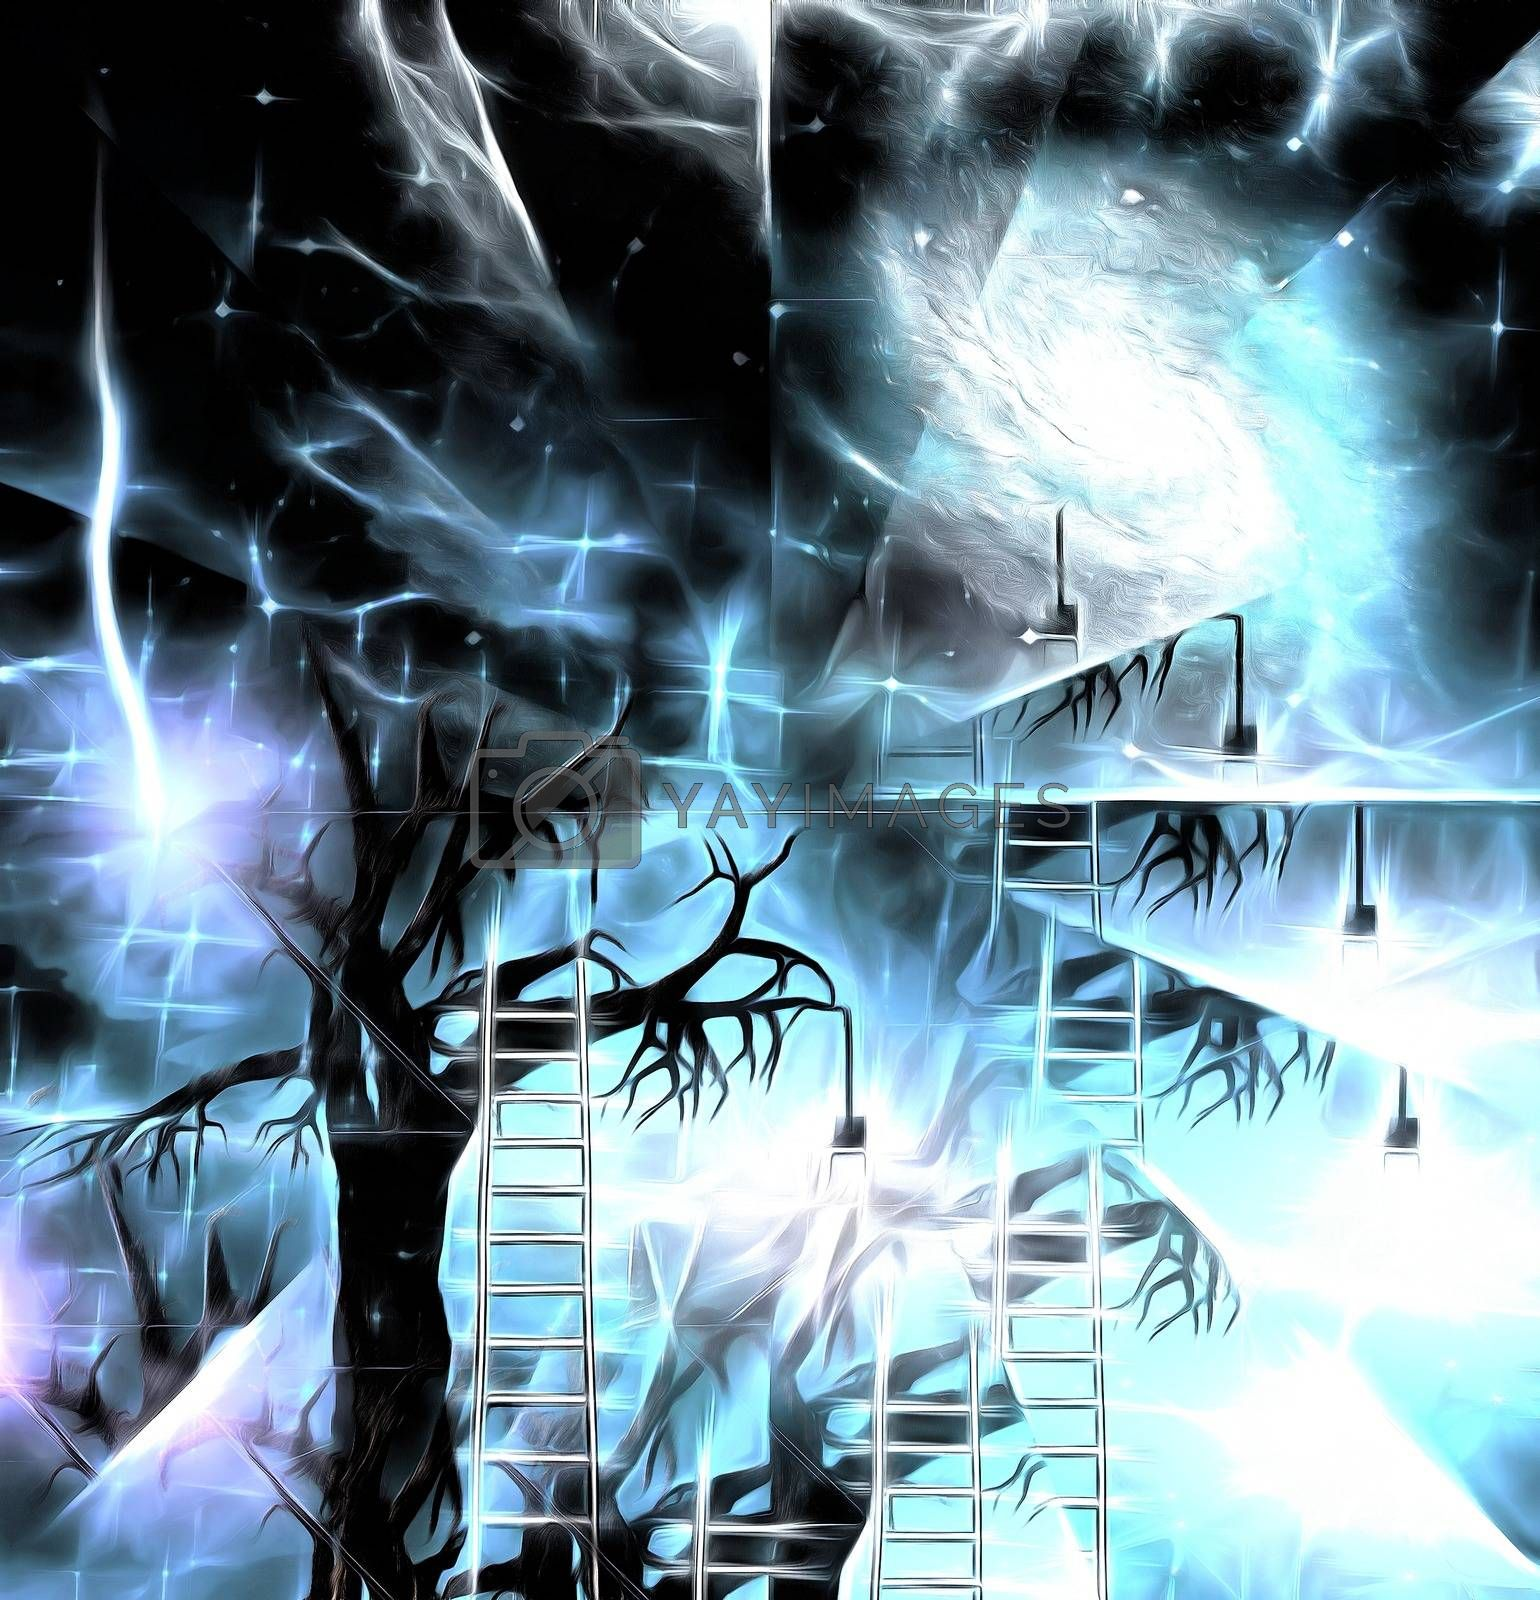 Tree with lightbulbs. Surreal art. 3D rendering